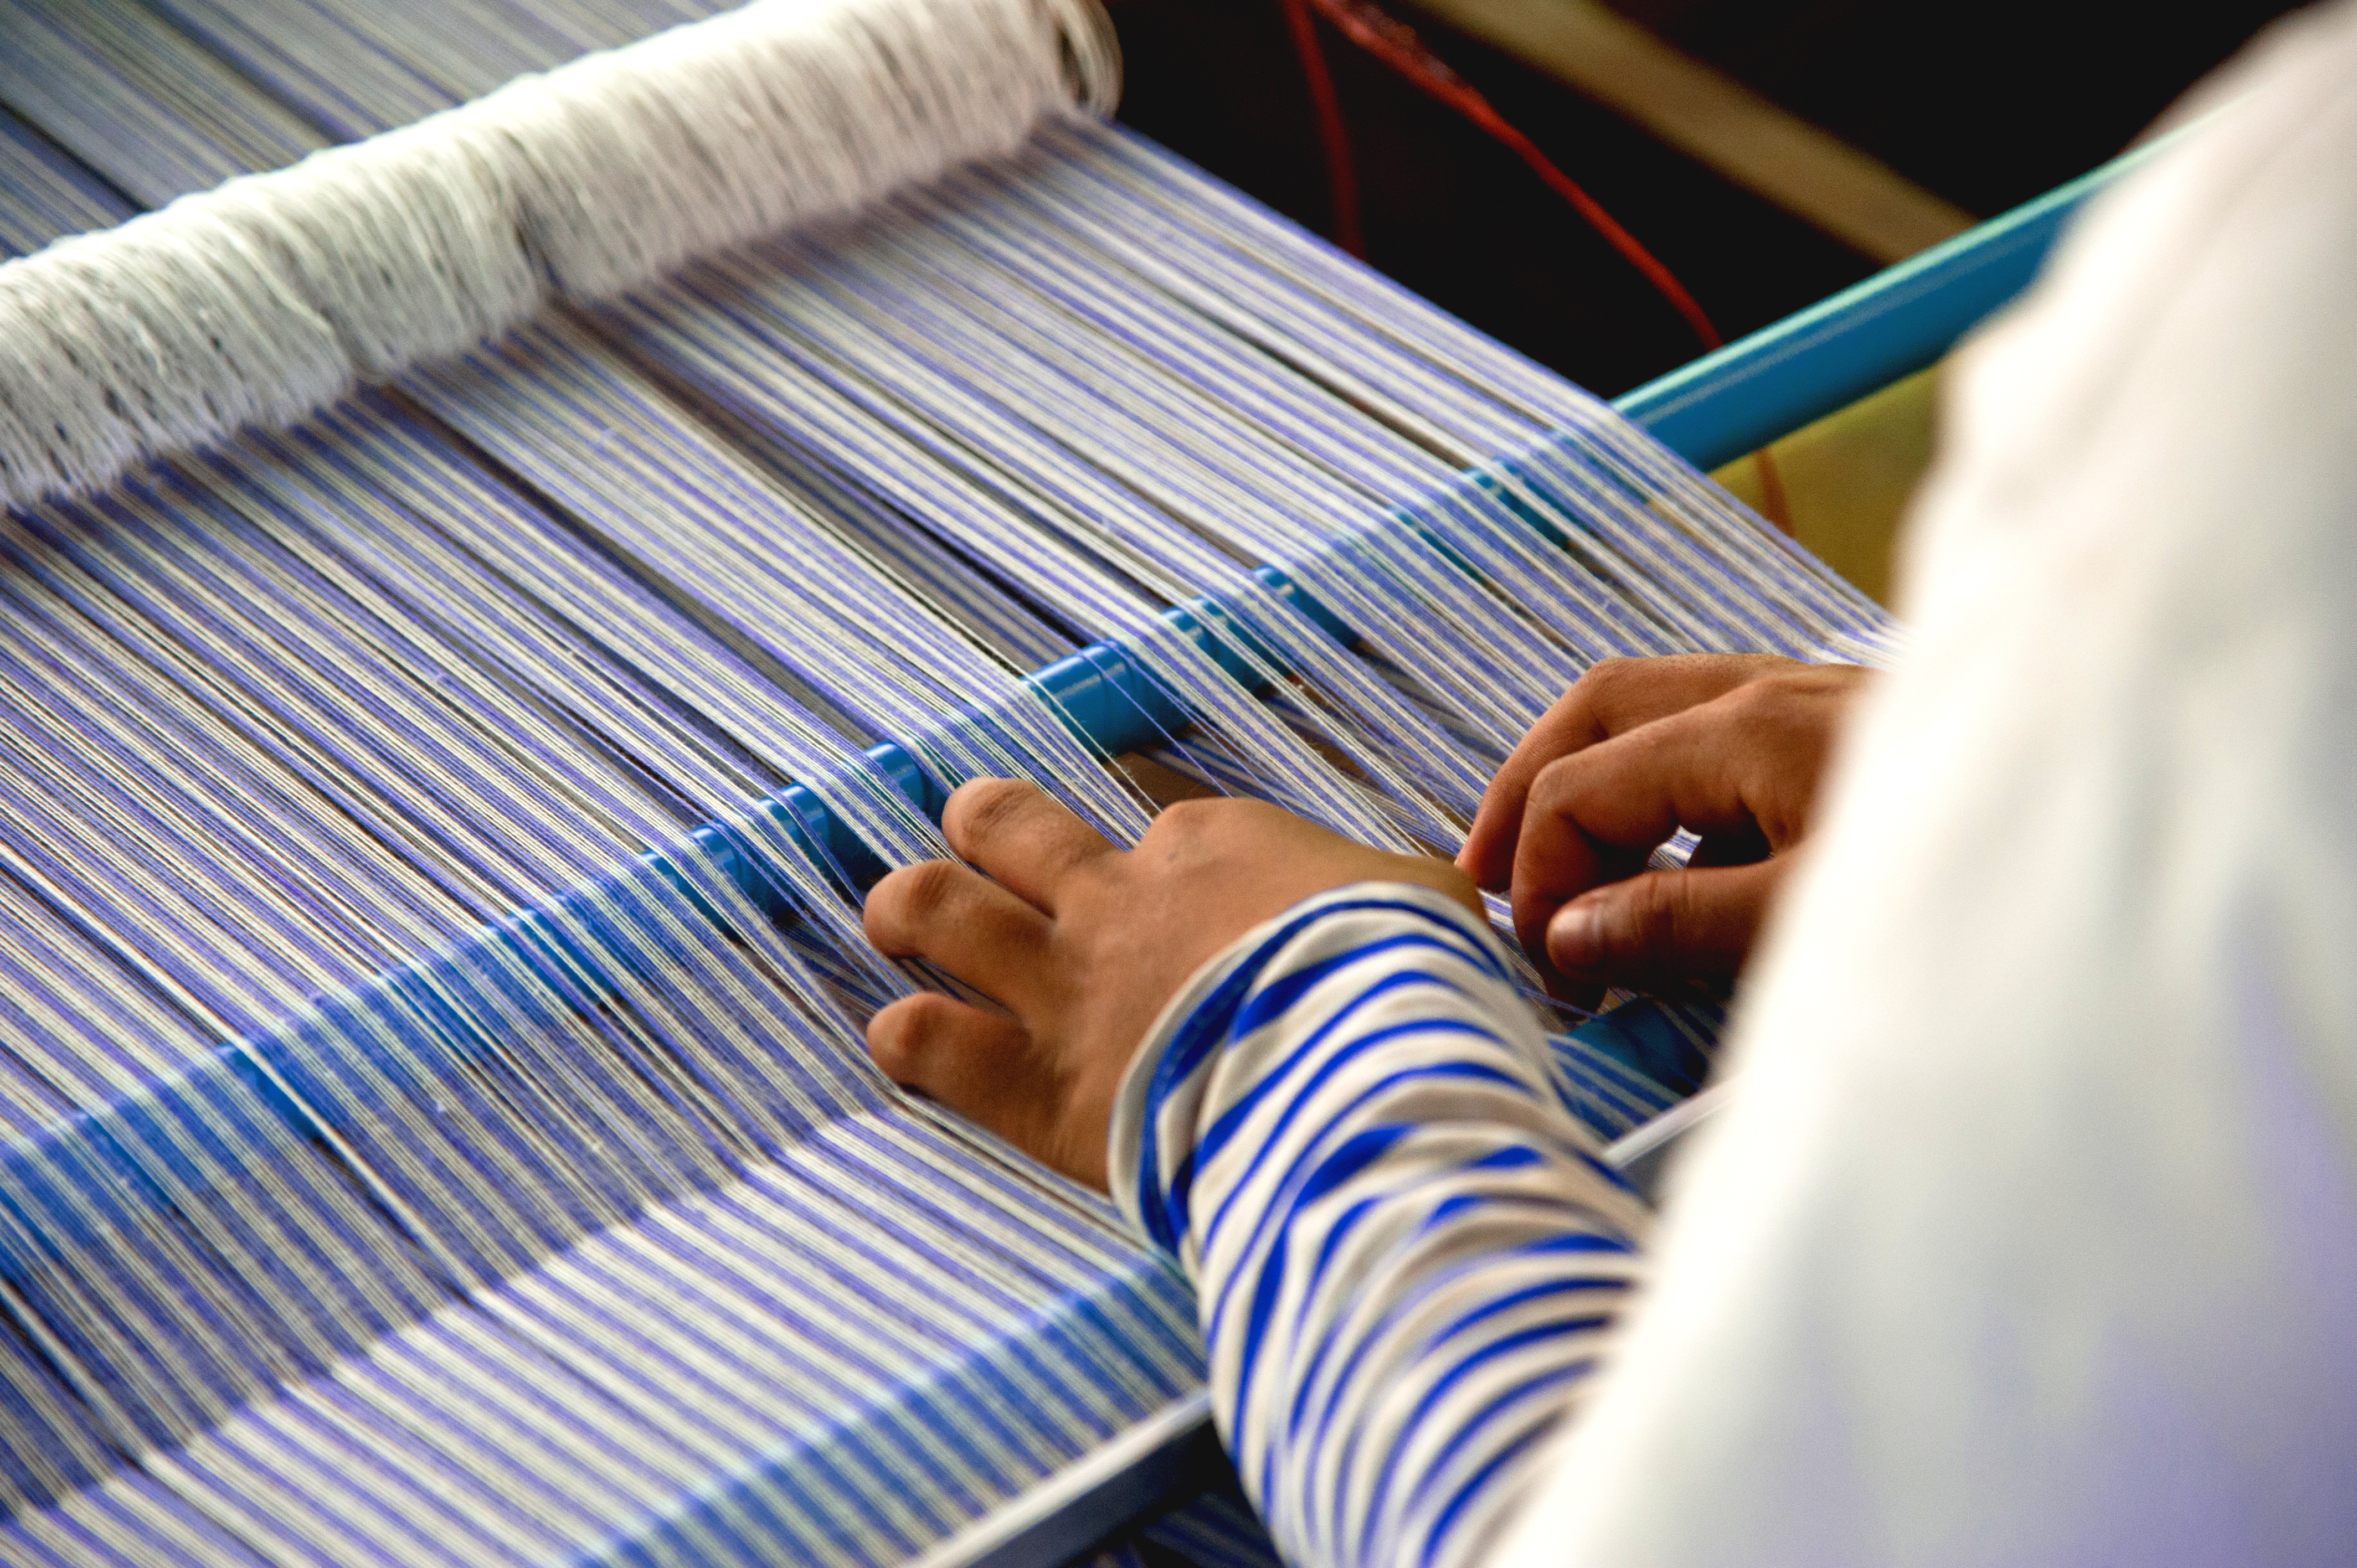 Making silk cloth